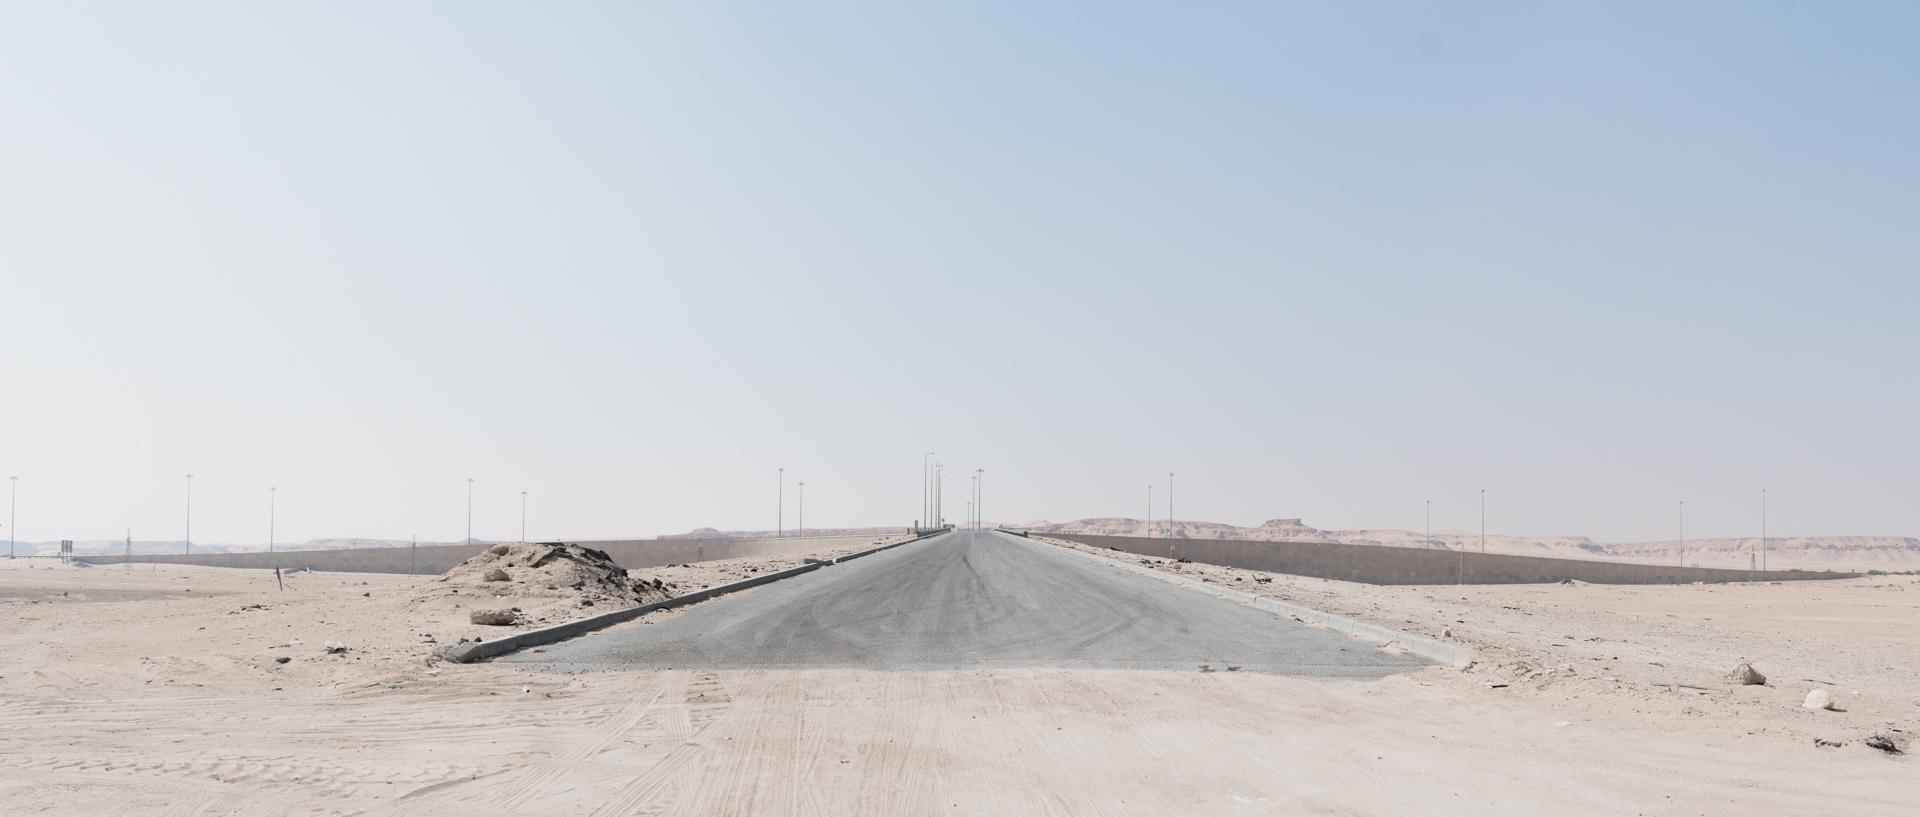 Desert meets civilisation.